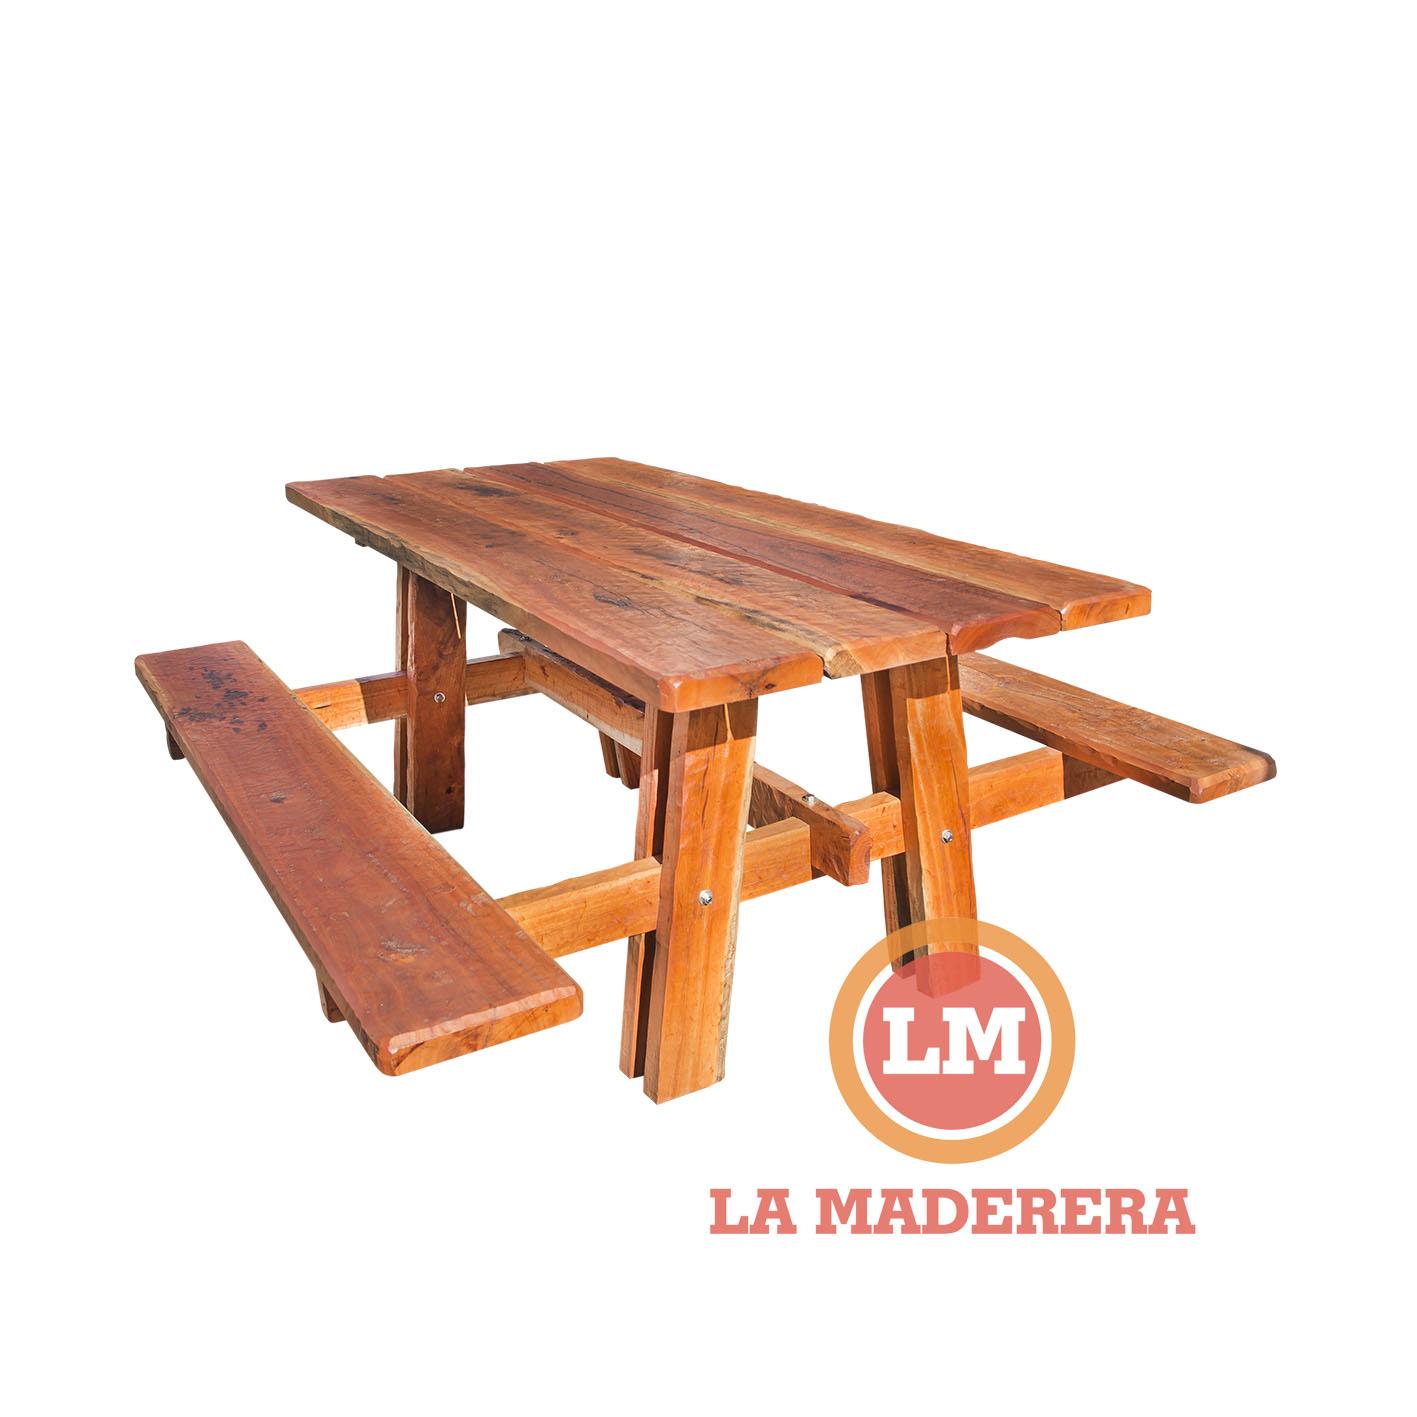 Mesa bancos tipo camping en quebracho colorado hachado for Mesa con bancos de madera para cocina